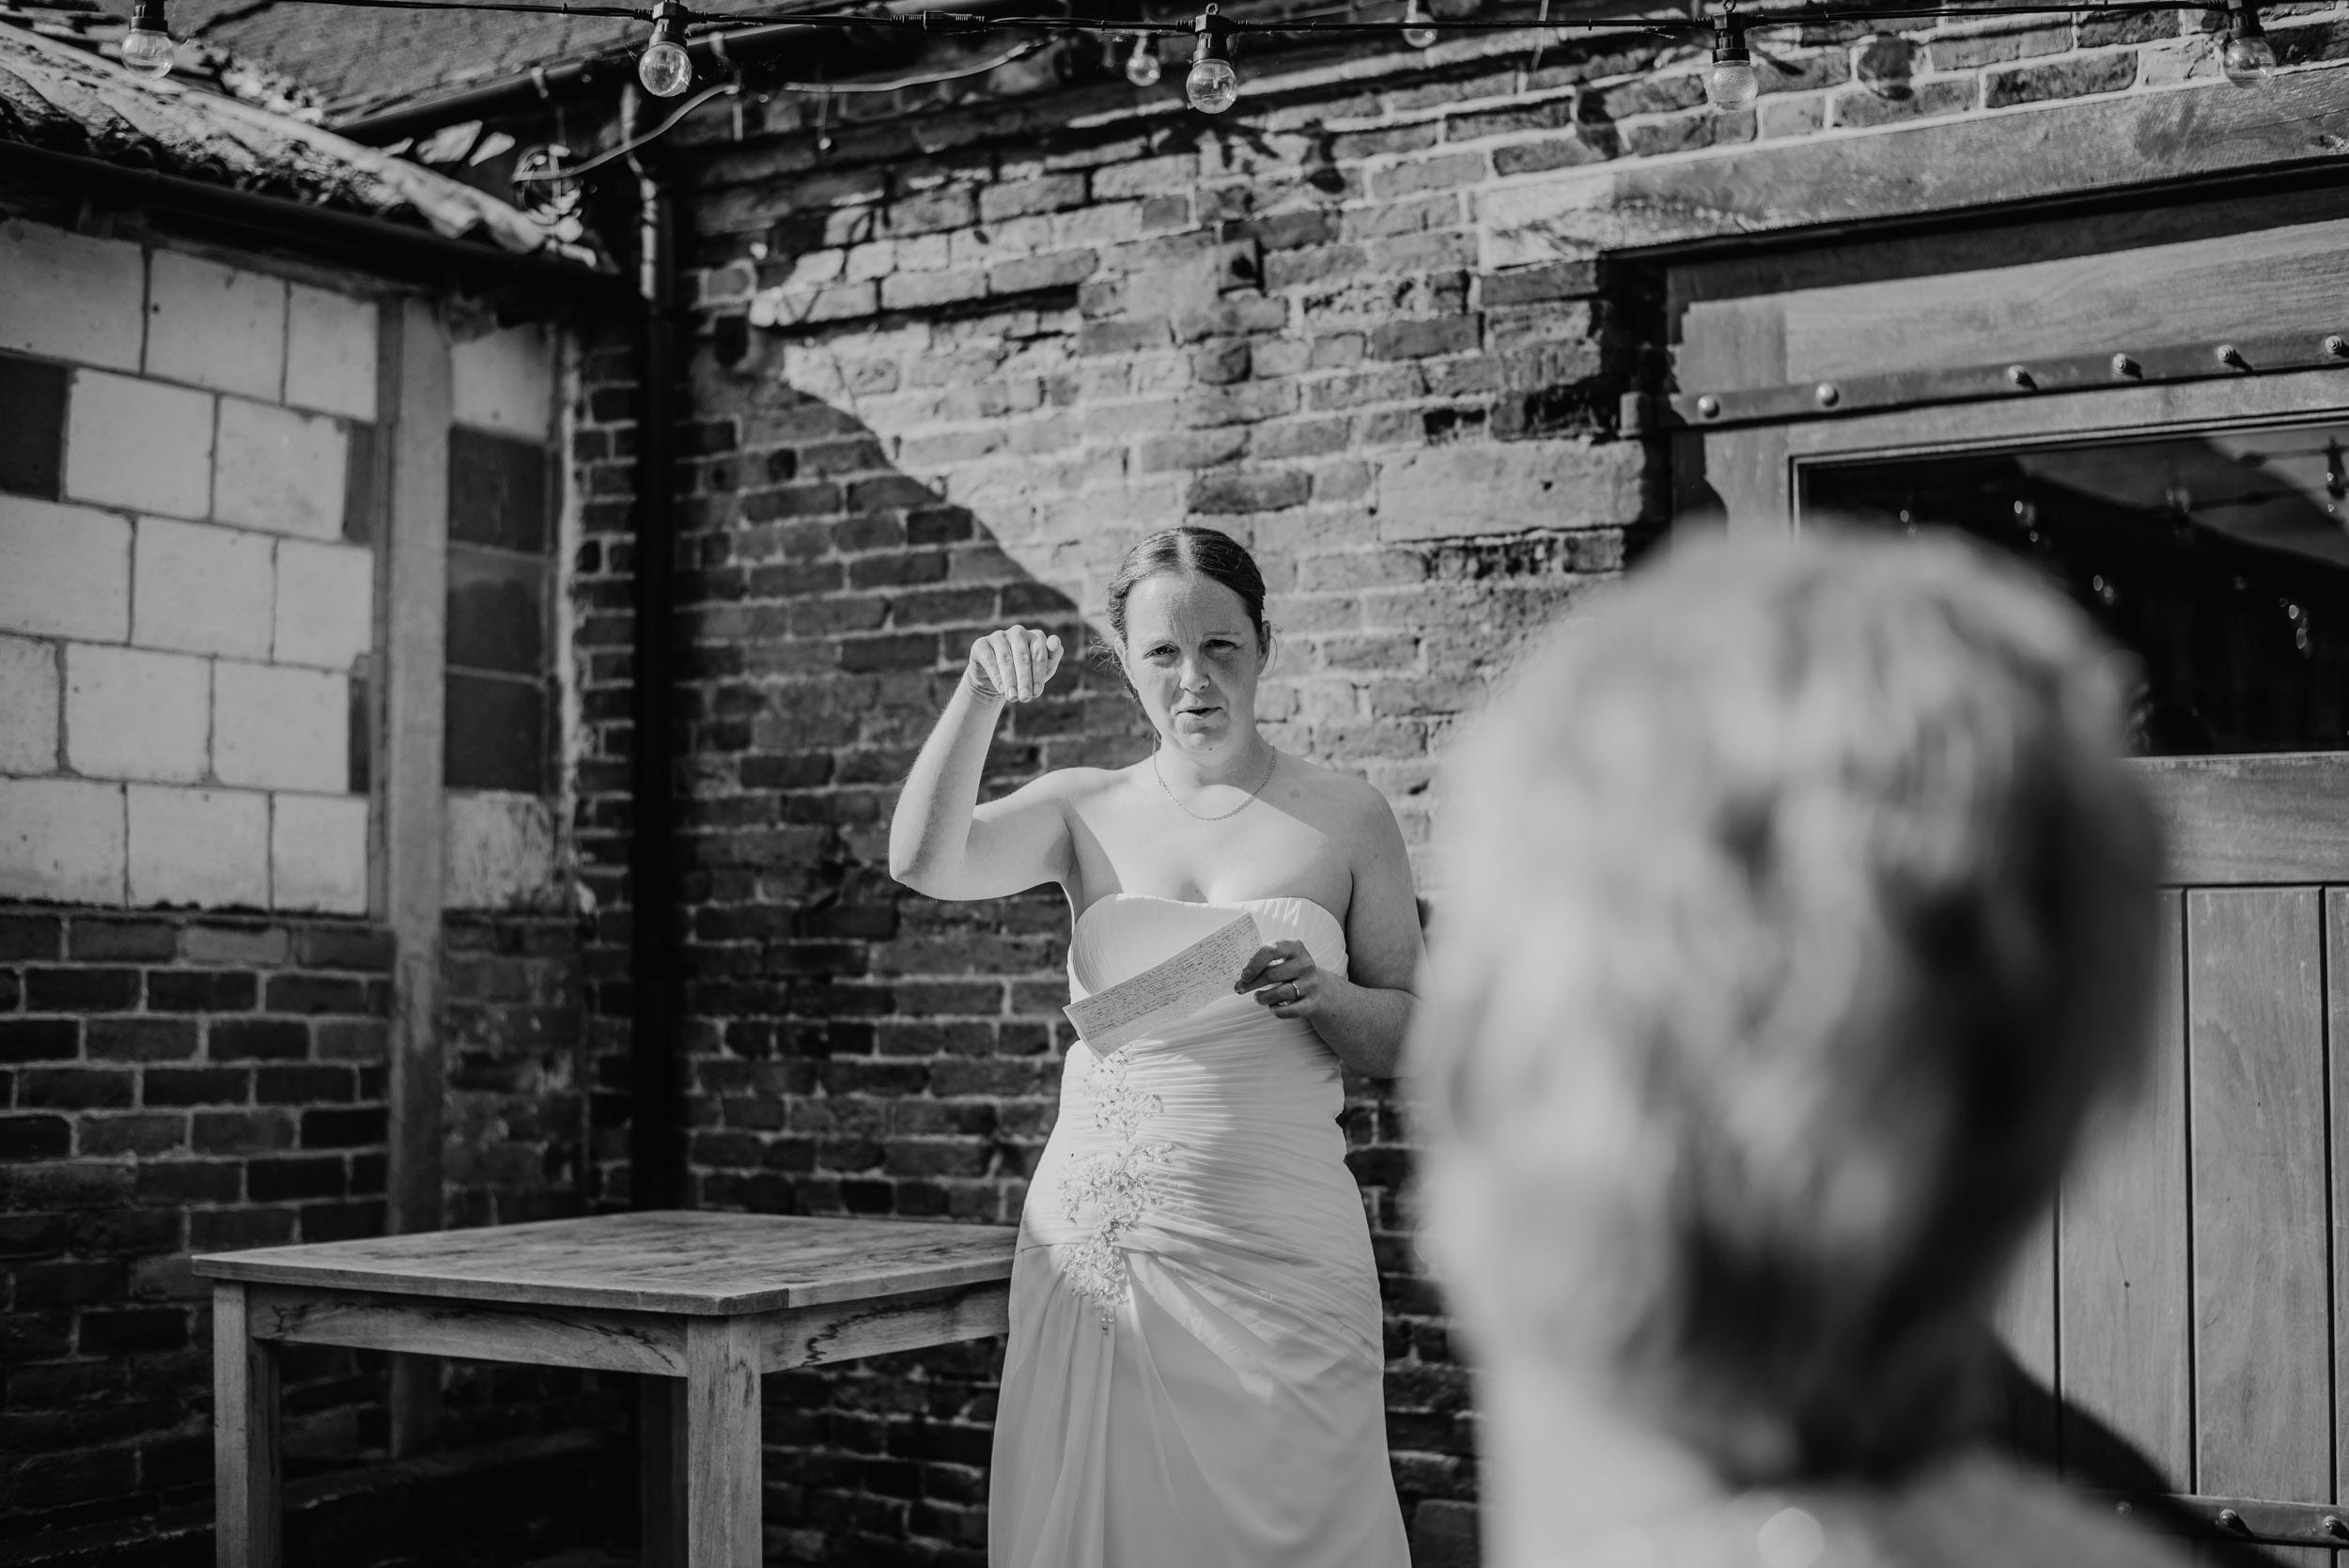 Donington-park-farm-wedding-photography-430.jpg